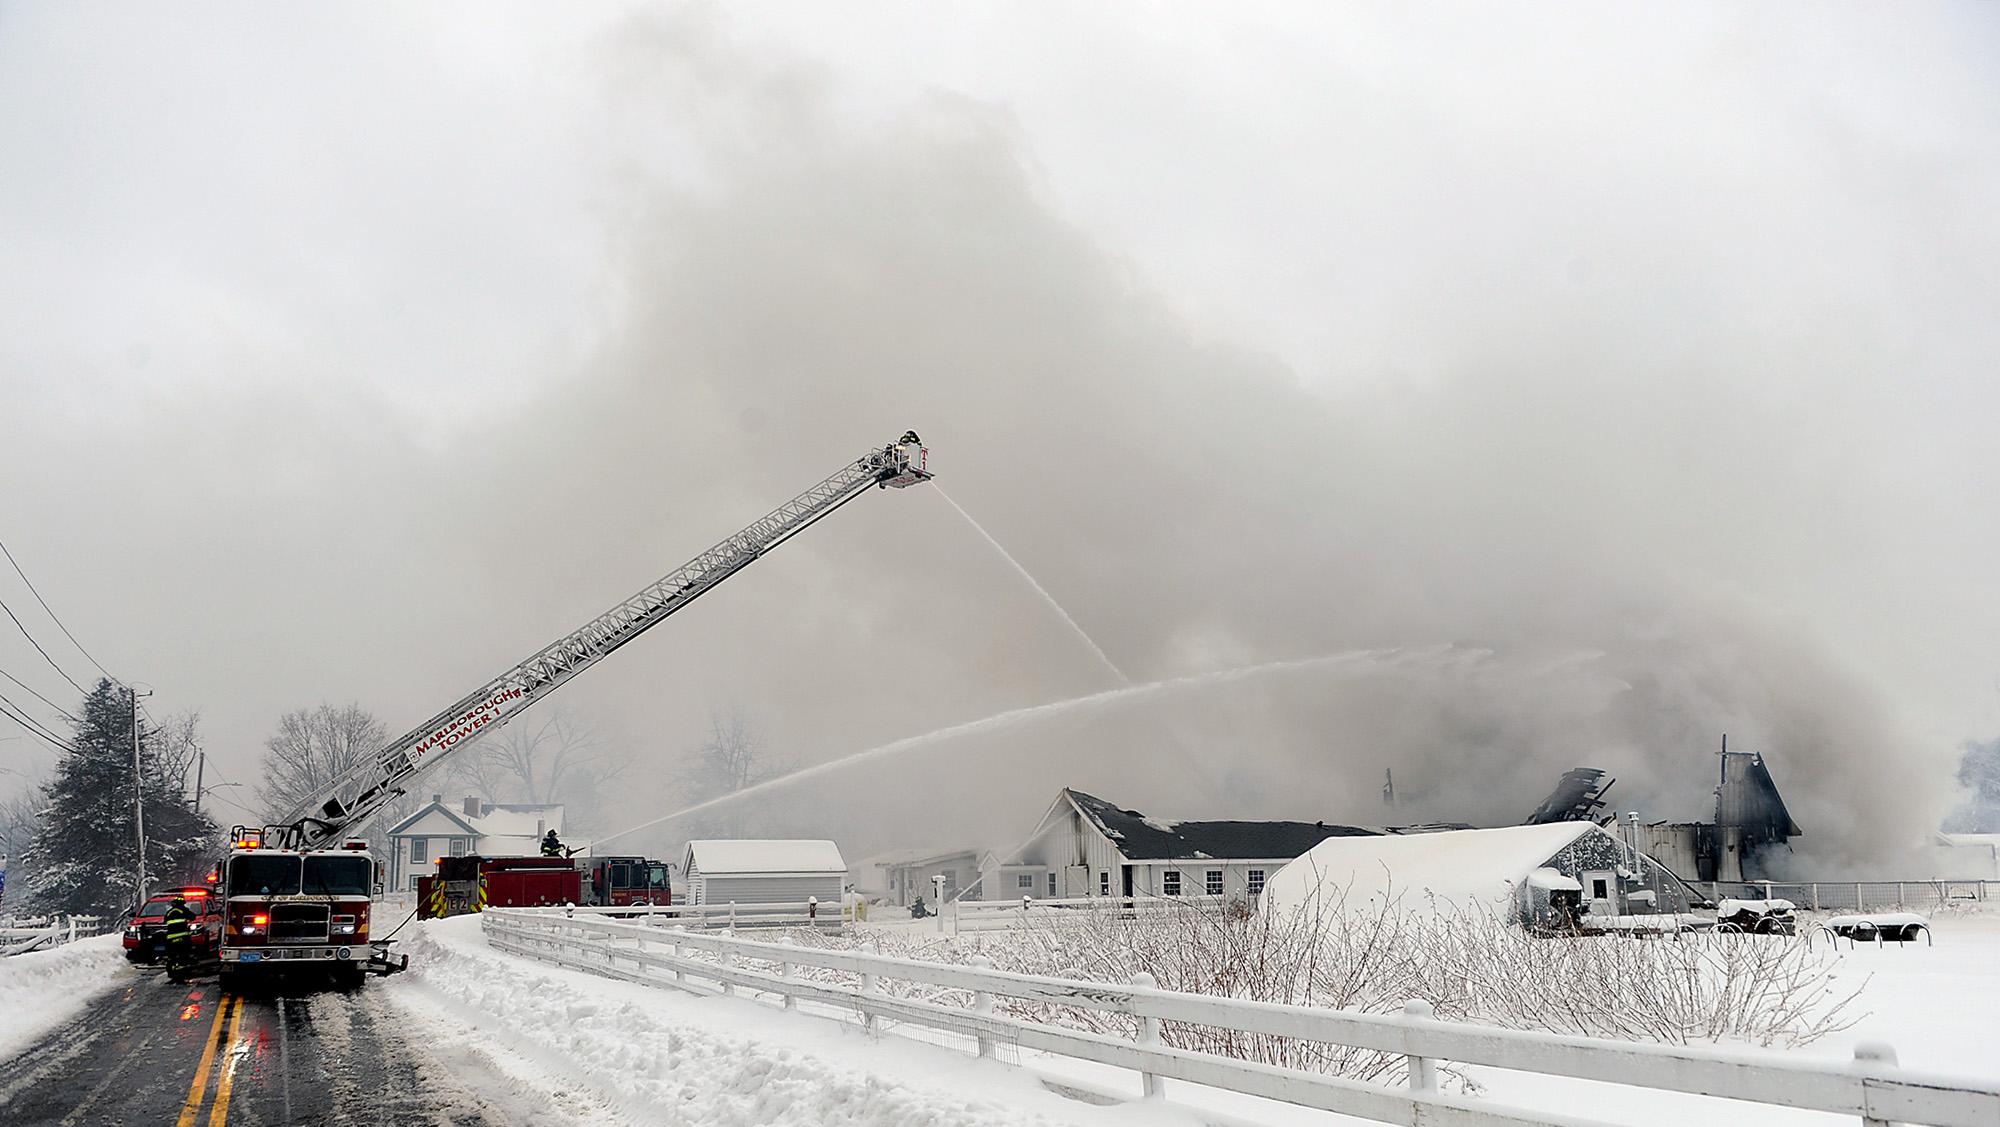 Firefighters pump water on a barn fire at the Hillside School farm in Marlborough, Feb. 2, 2021.